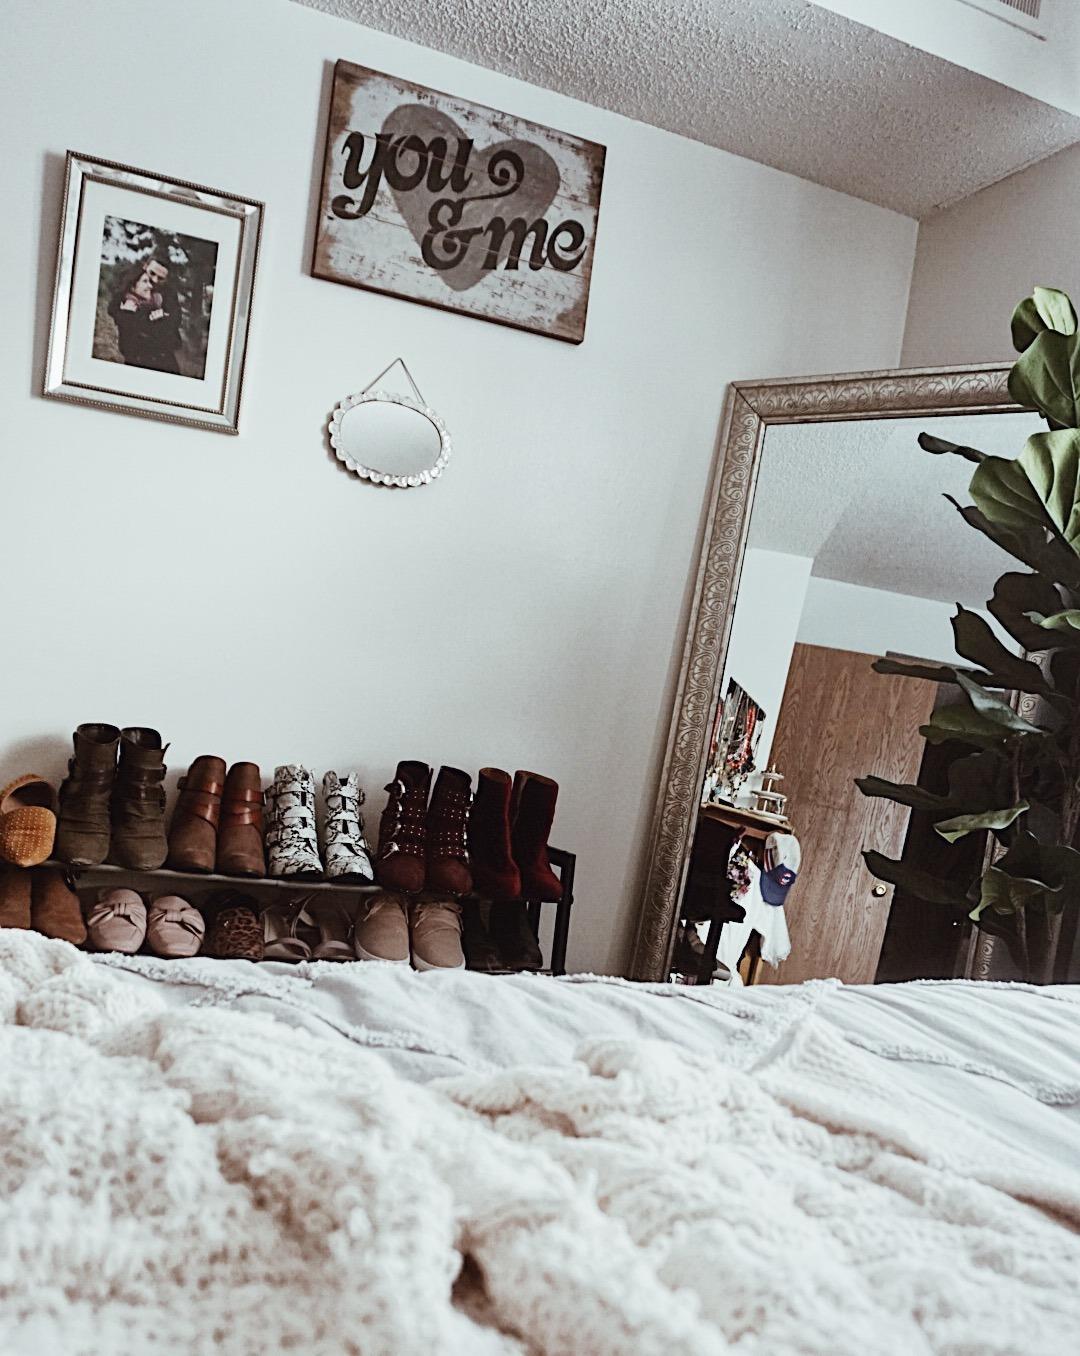 Bedroom Refresh with Wayfair - New Spring Bedroom Decor with greenery | Everydaychiffon